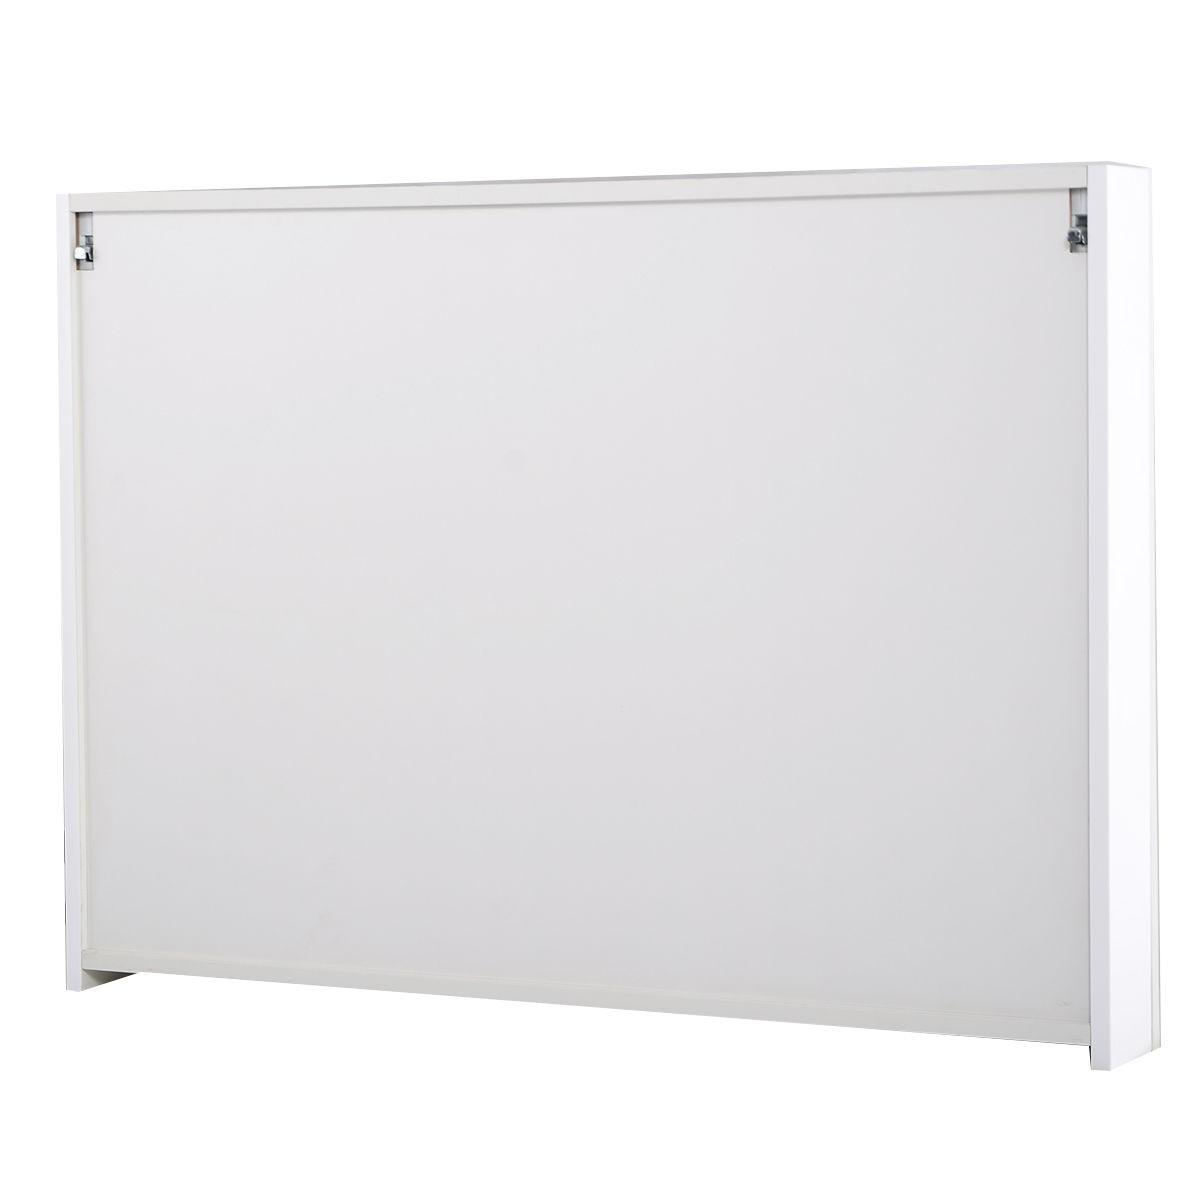 36 20 Wide Wall Mount Mirrored Bathroom Medicine Cabinet Storage 3 Mirror Door Ebay